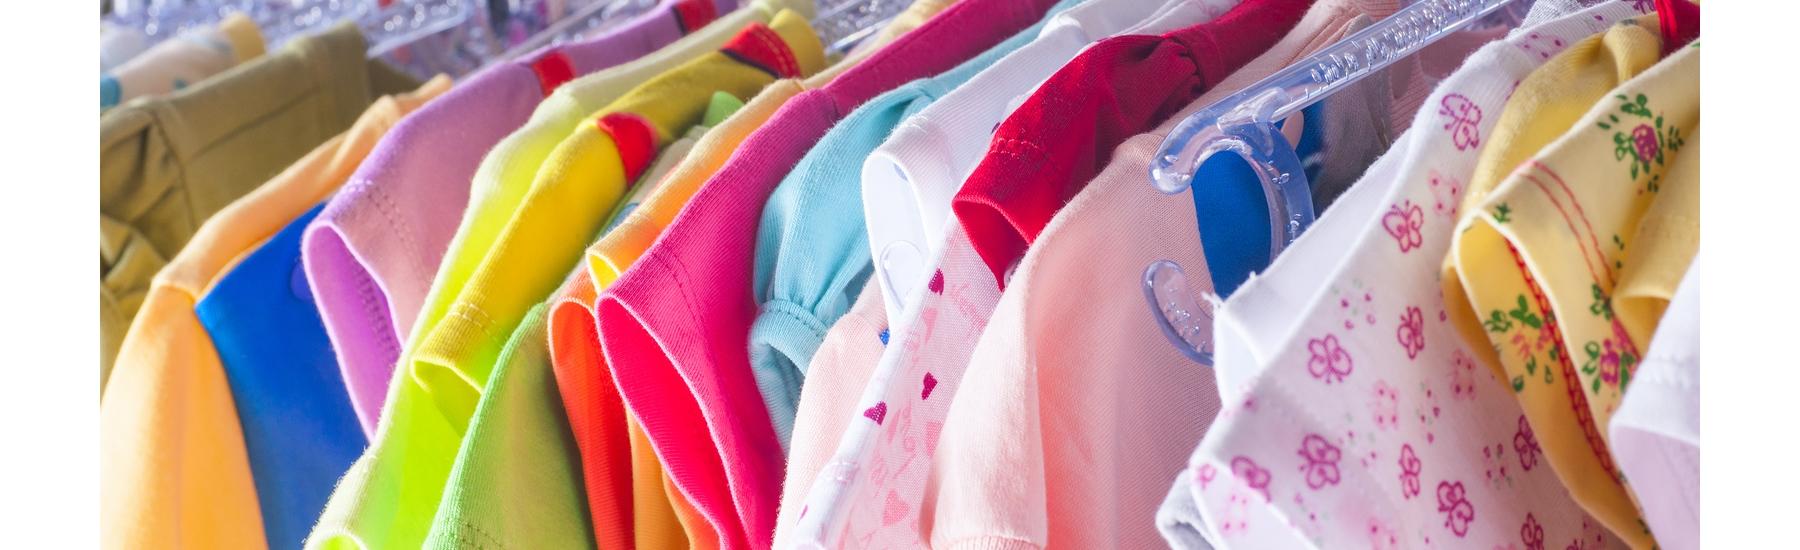 Kids clothes on hanger